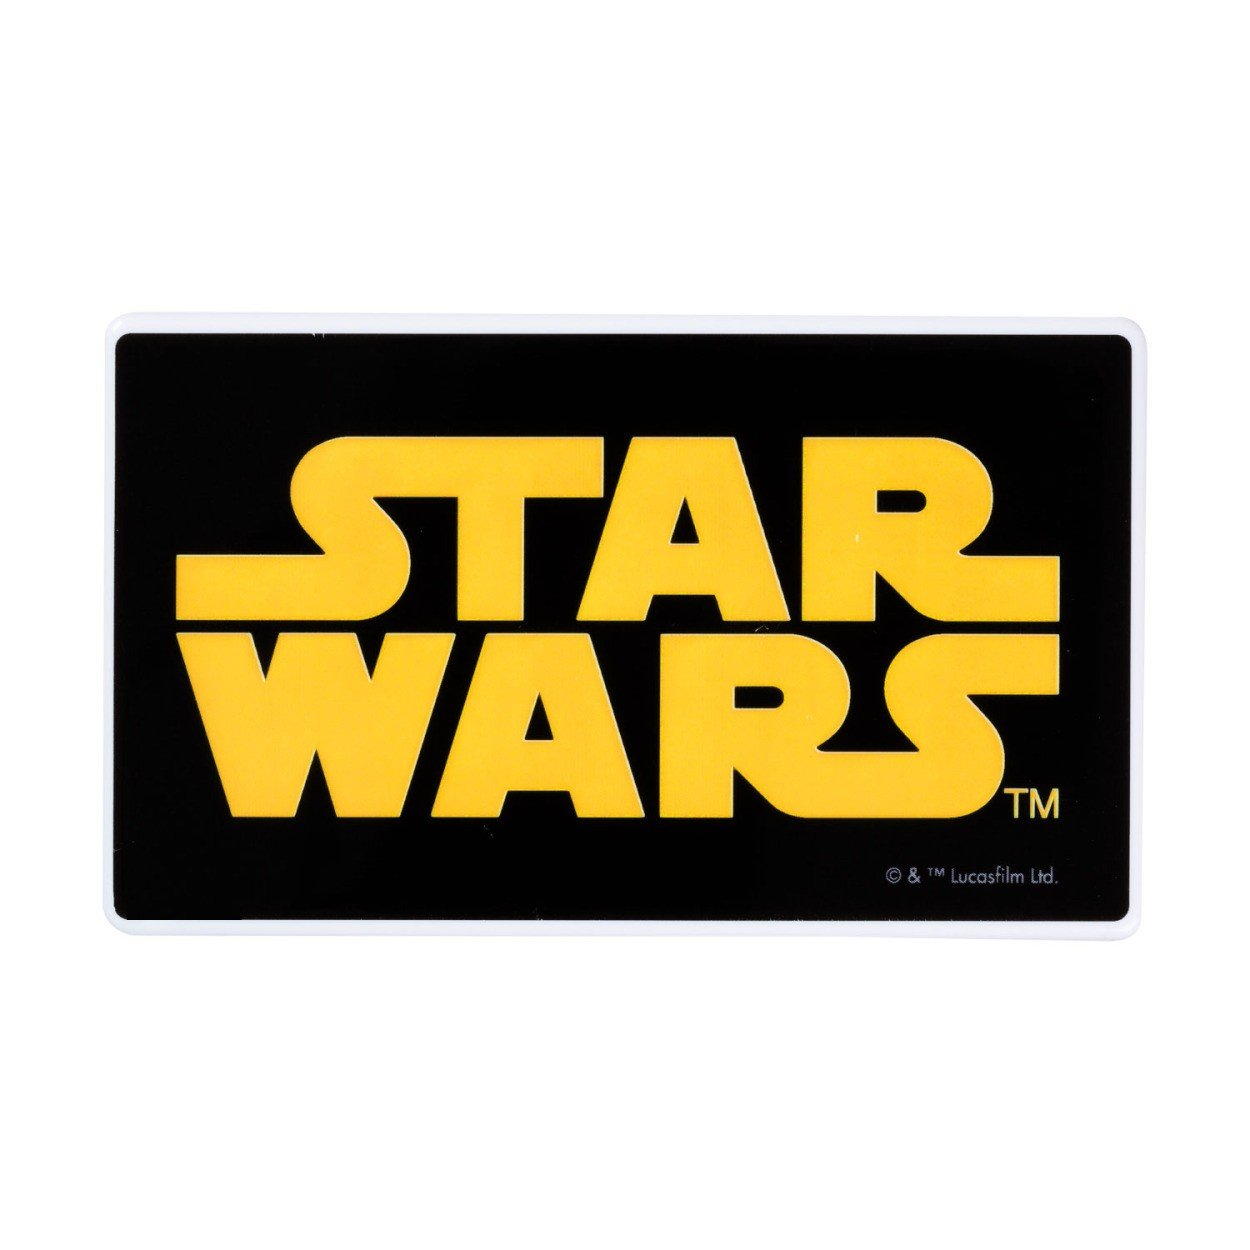 HAMEEその他 スマートフォン用[micro USB/USB給電] USBモバイルバッテリー+micro USBケーブル 30cm (3000mAh・スターウォーズ/ロゴ) STARWARS3000バッテリーLOの画像